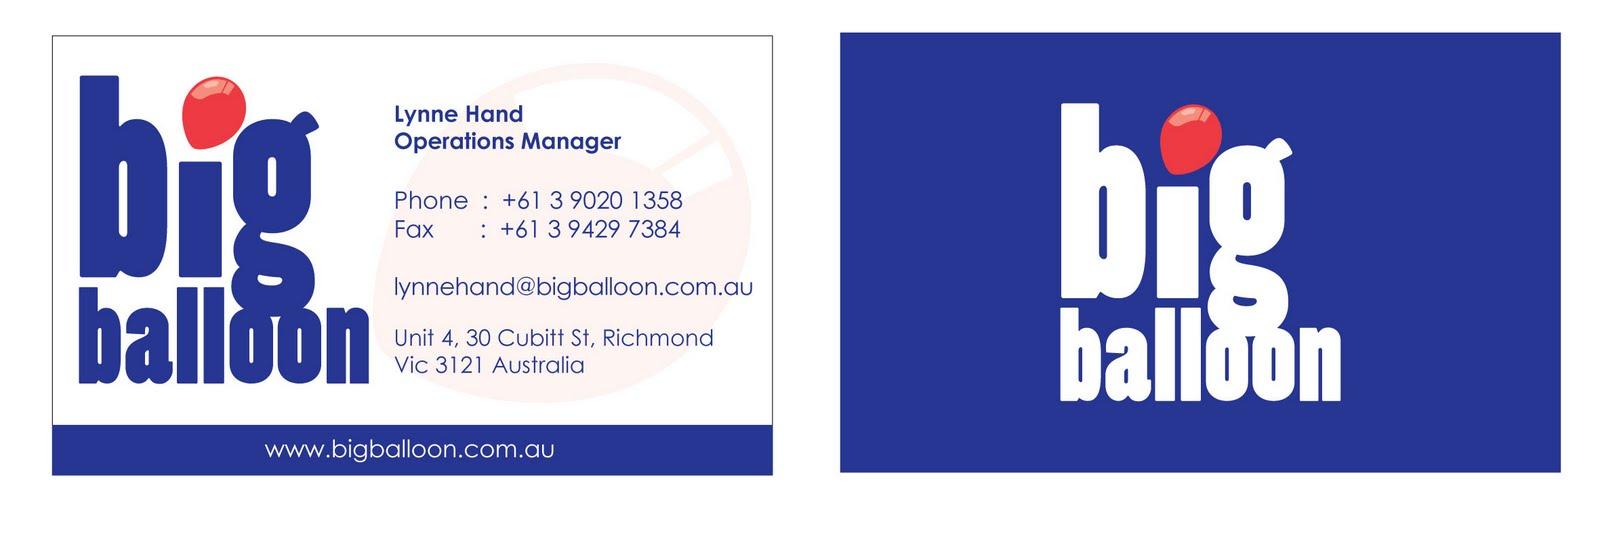 Big Balloon Medium Business Card Task Create Business Card For Big